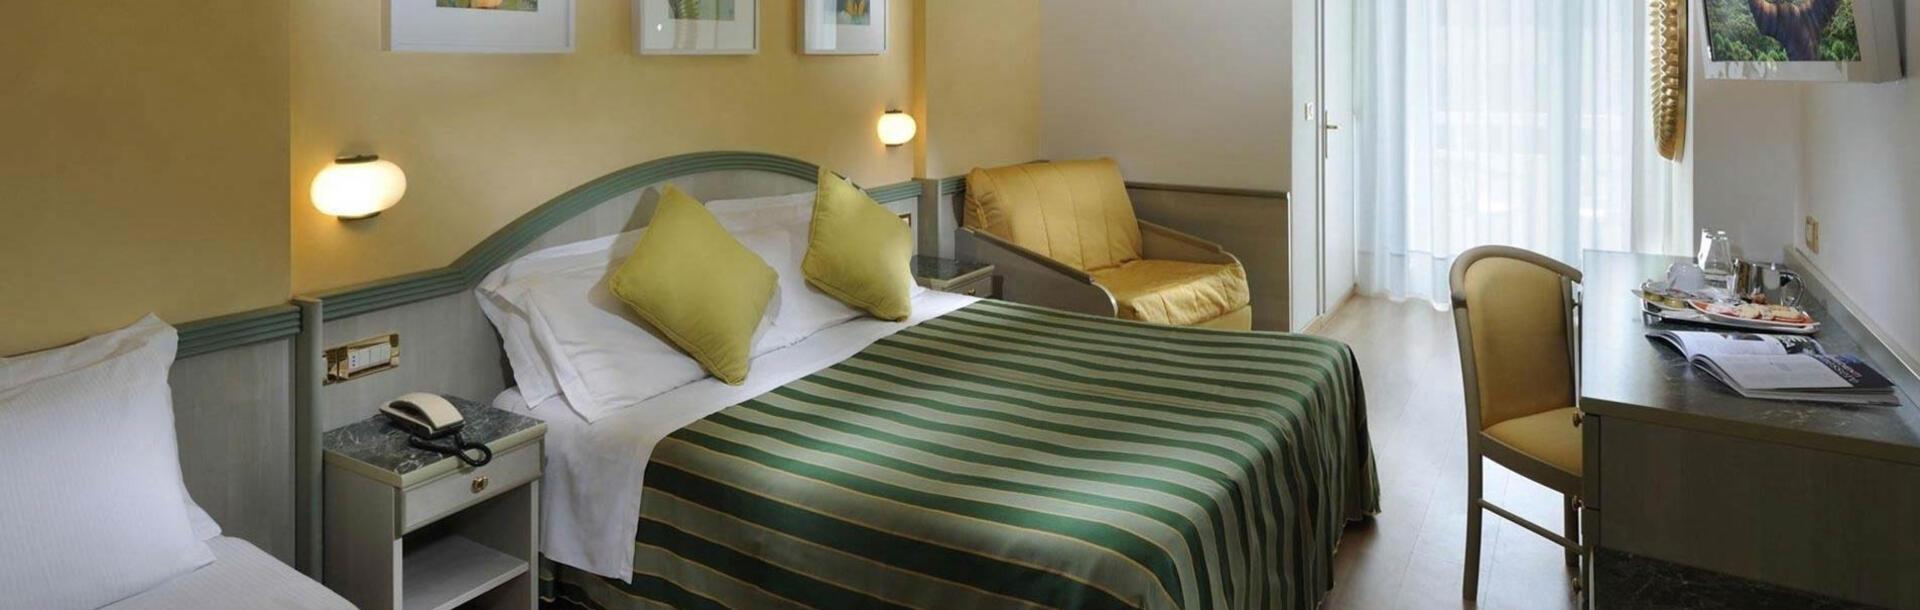 hotel-montecarlo it camera-rubino 014